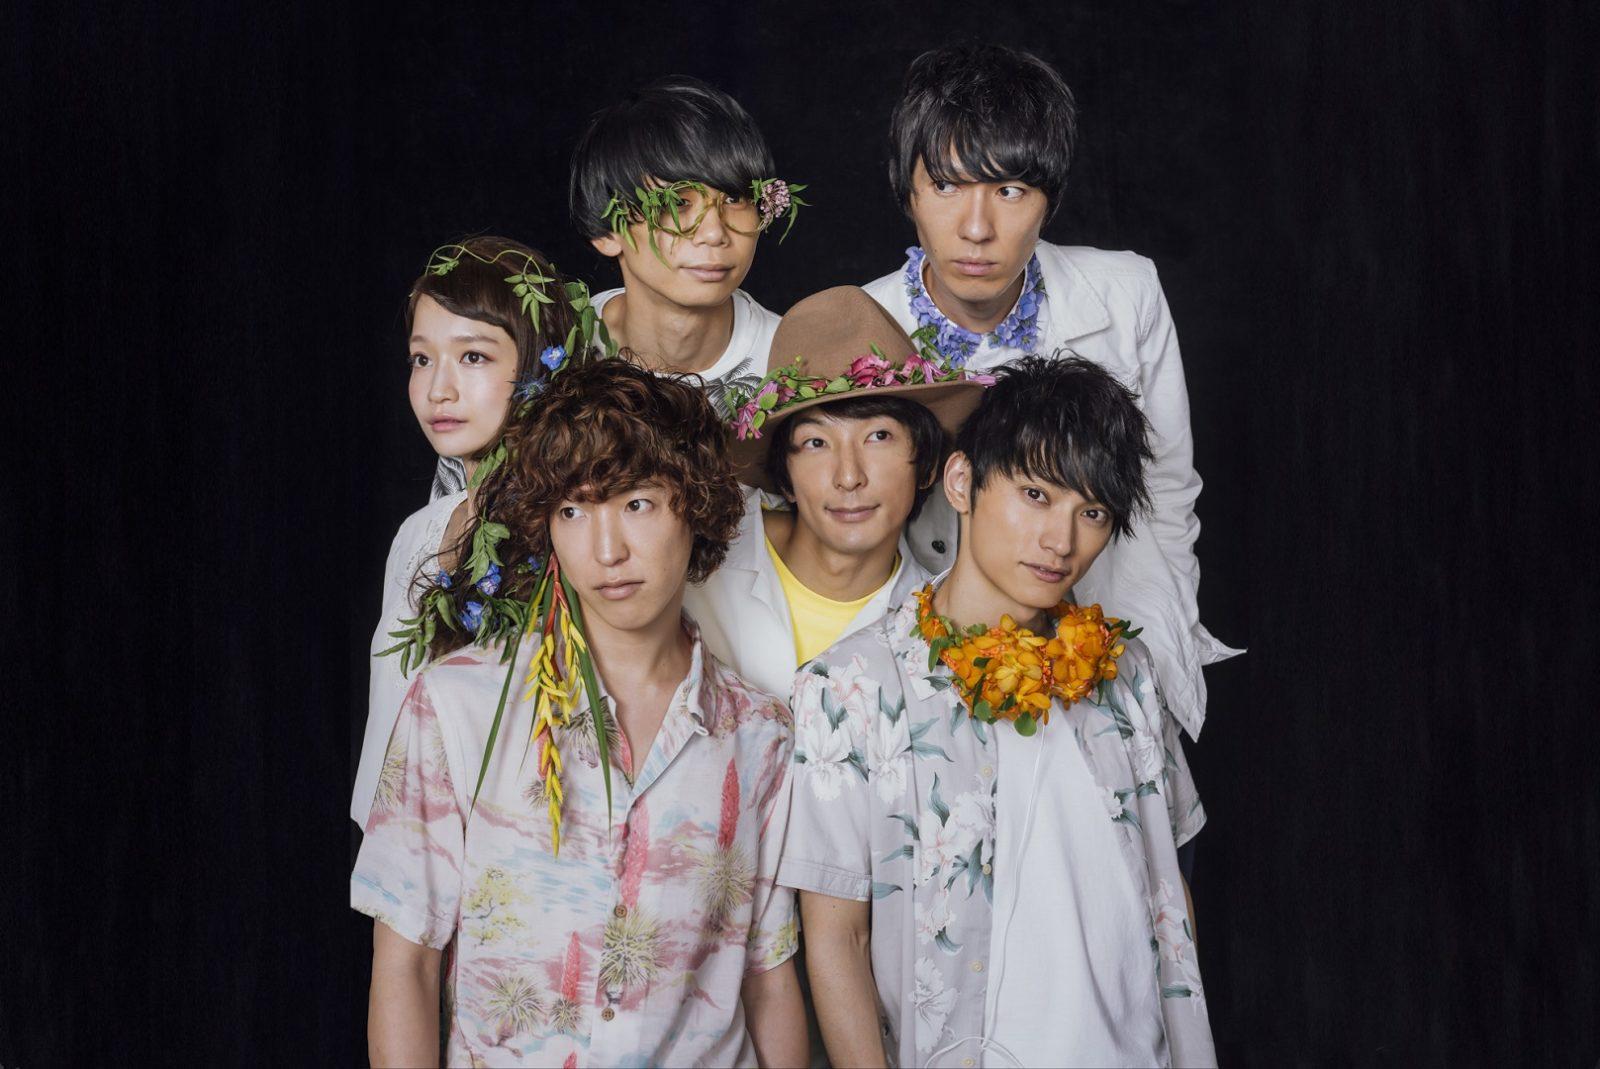 Czecho No Republicの「COUNTDOWN JAPAN 17/18」ステージにSKY-HIが登場決定サムネイル画像